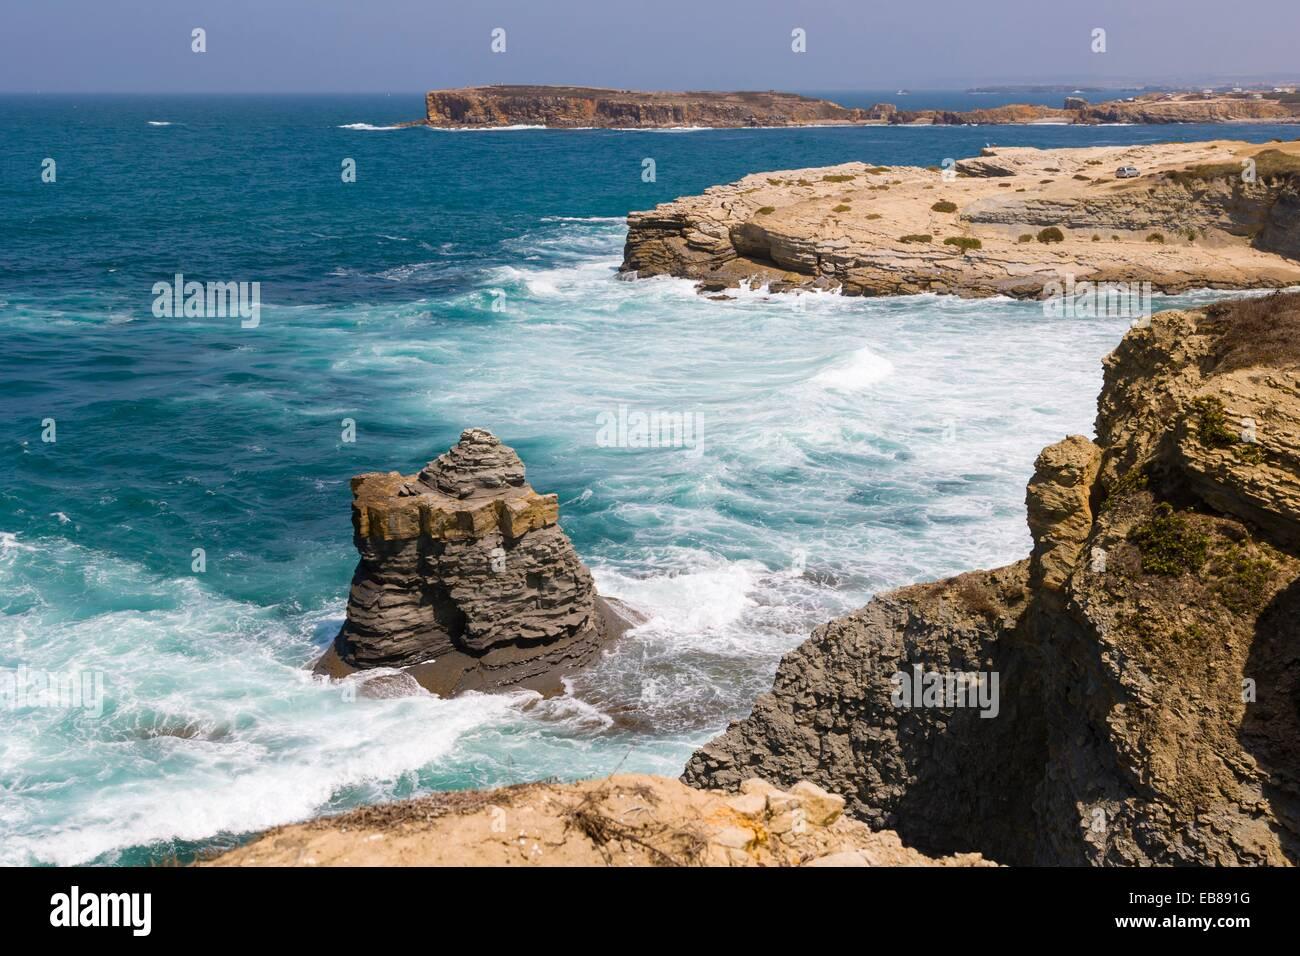 North Coast, Peniche, Leiria District, Pinhal Litoral, Portugal. - Stock Image